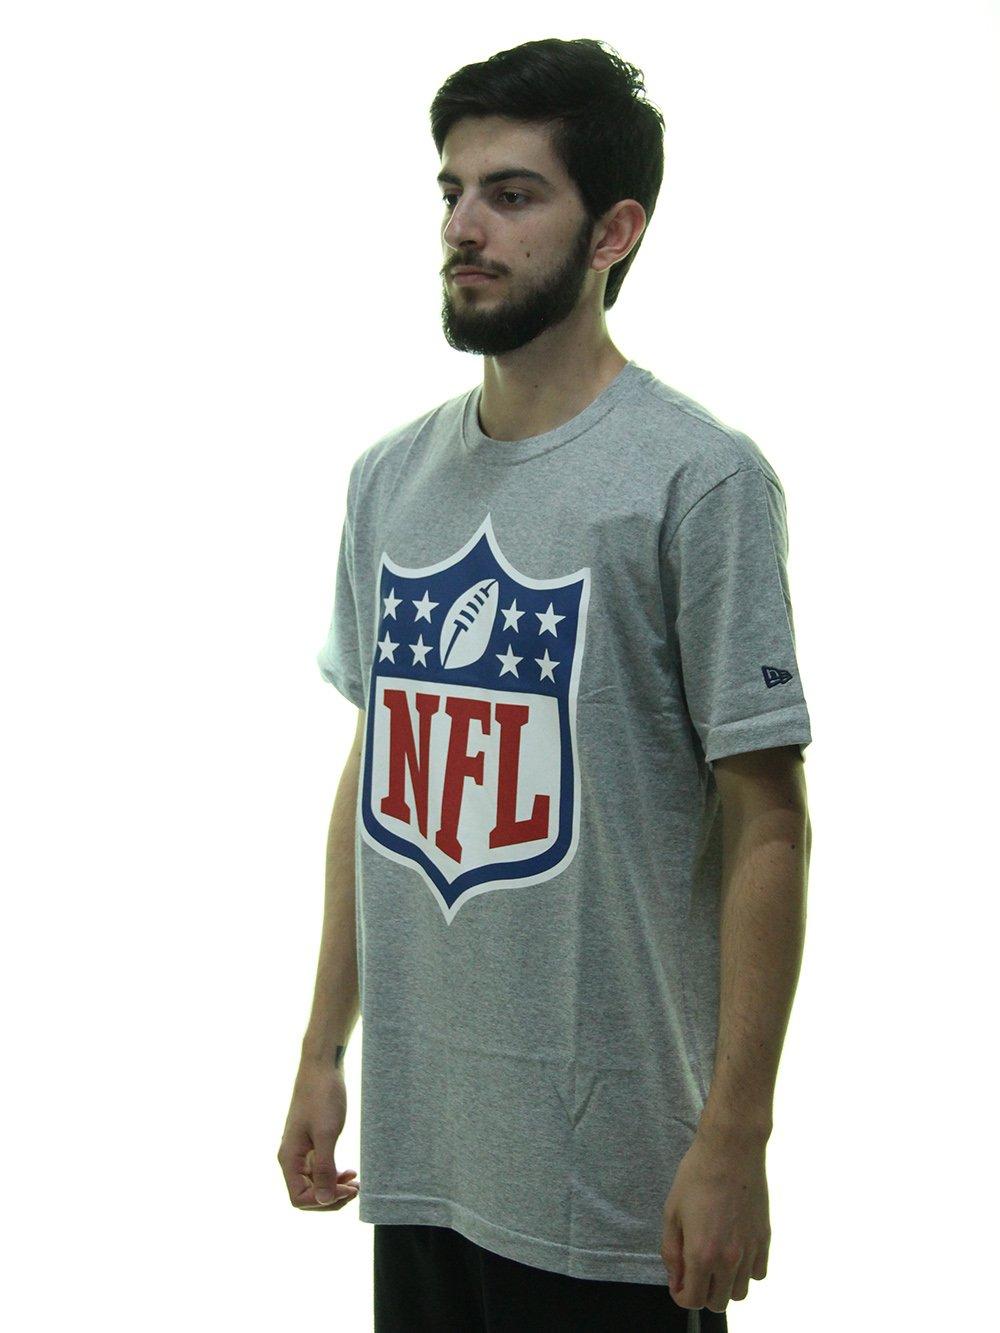 ... Camiseta Masculina New Era Logo NFL Estampada Manga Curta - Cinza  Mesclado ... 6109d5118be